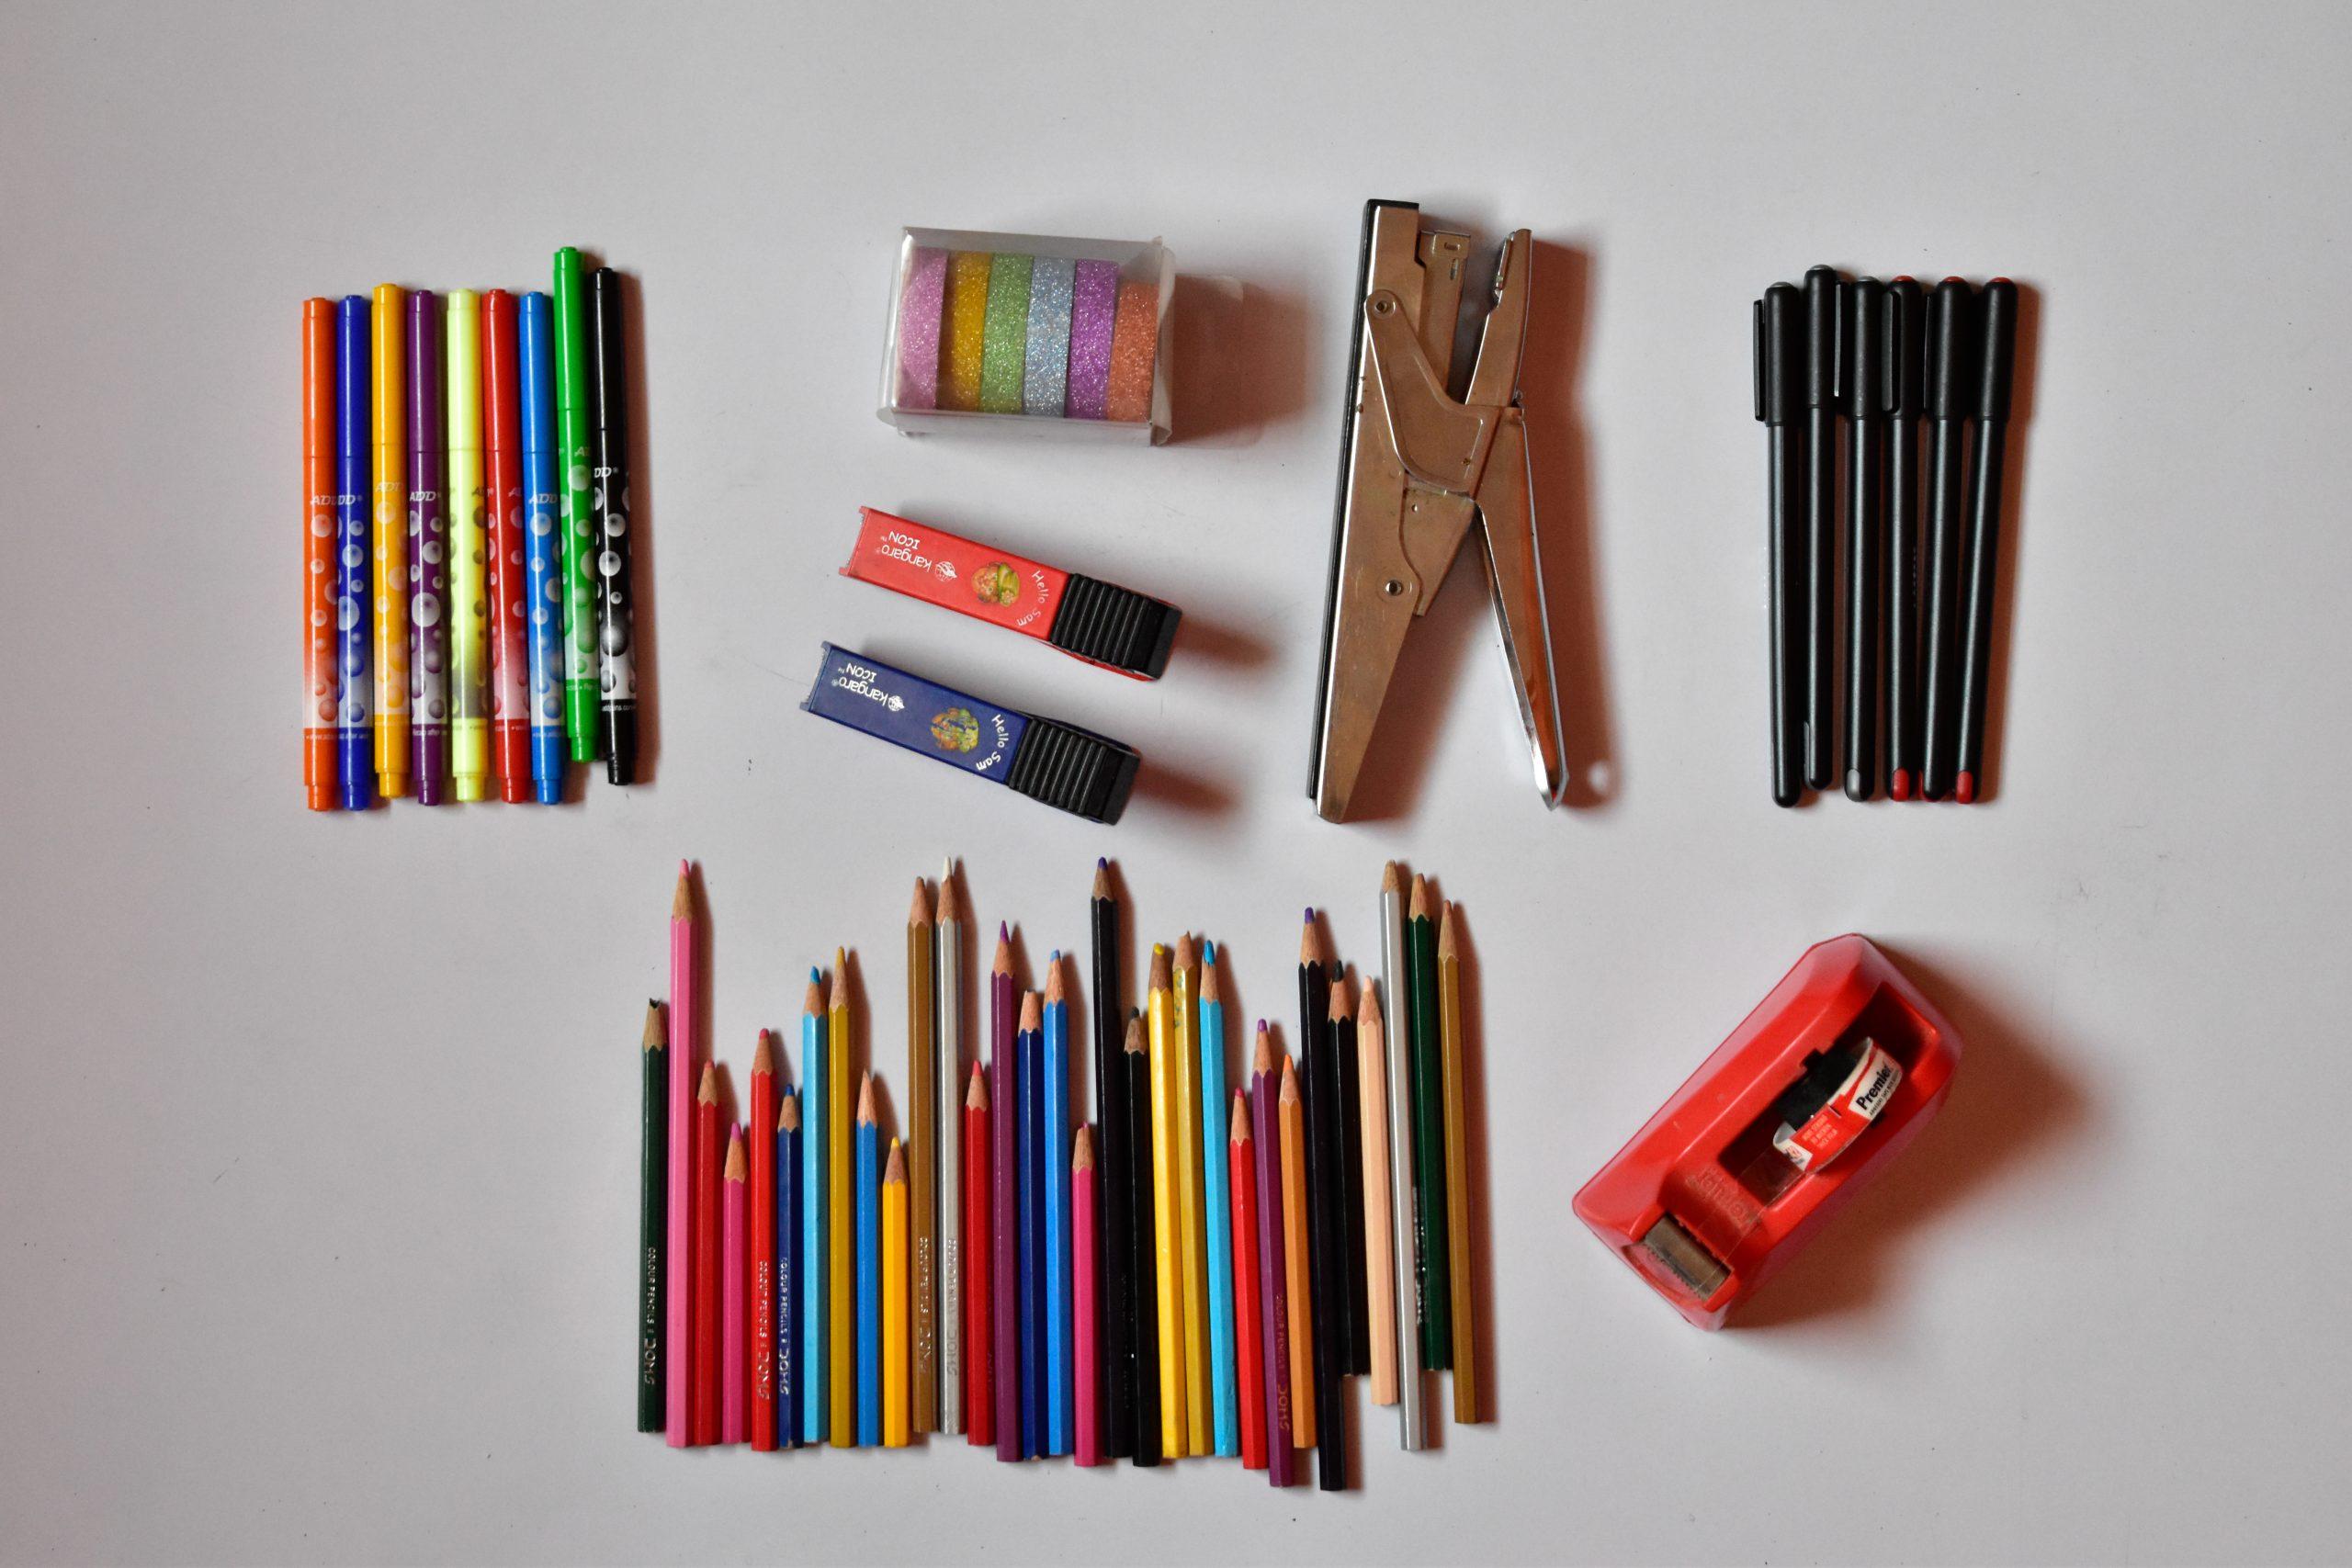 Stationery items